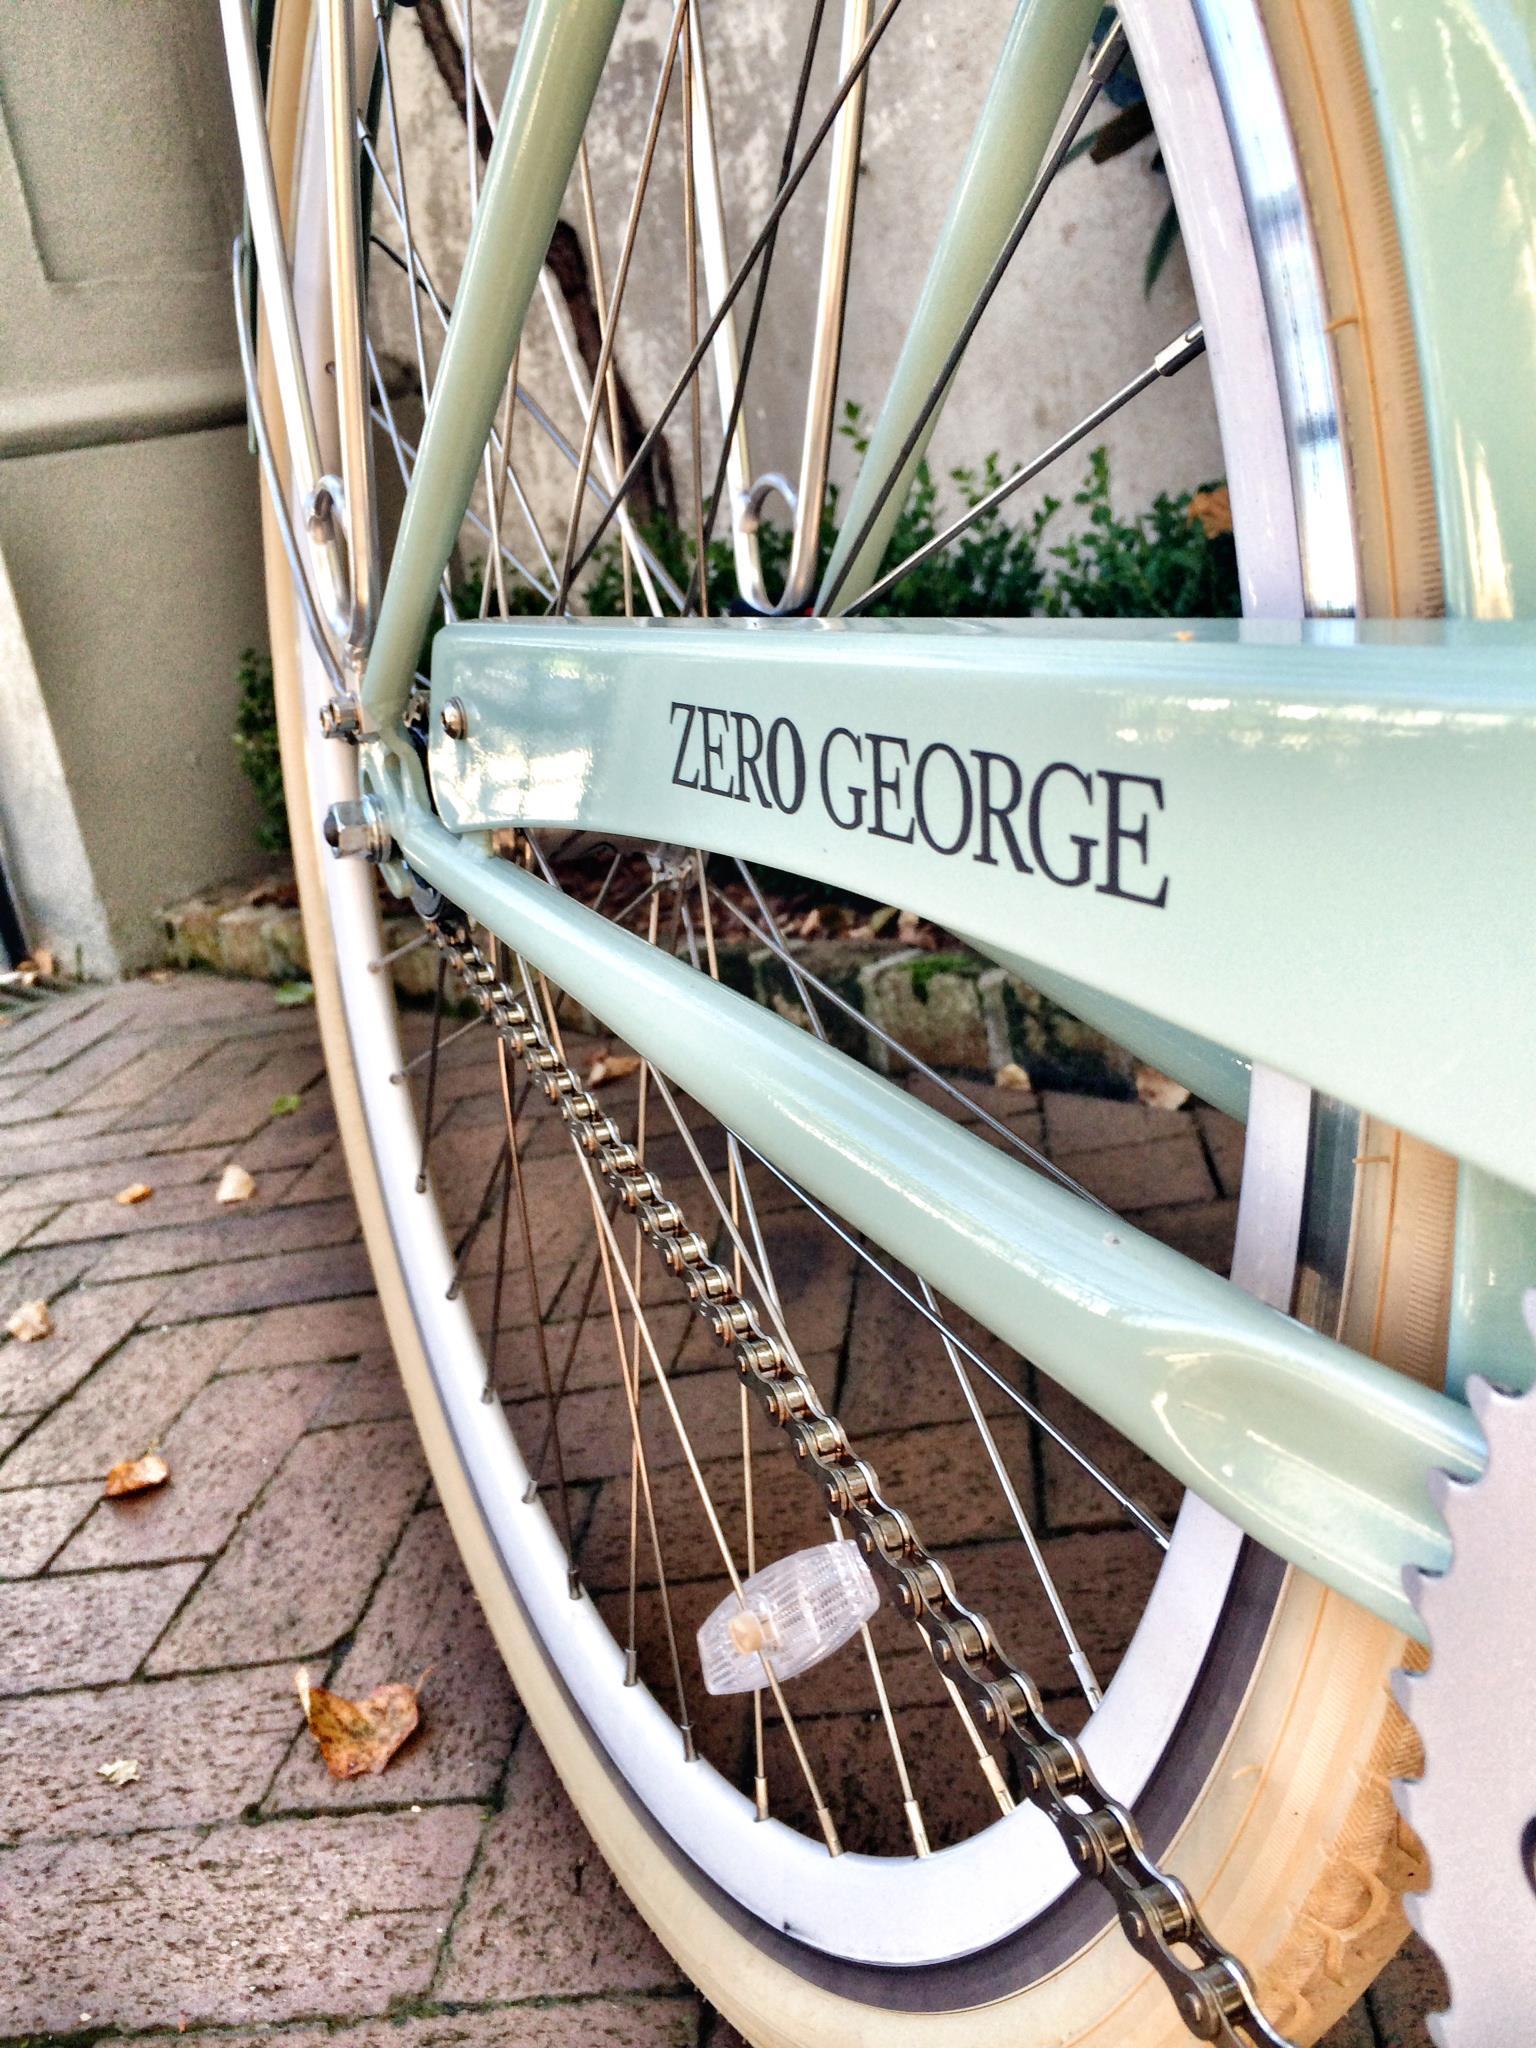 Zero George Hotel3.jpg